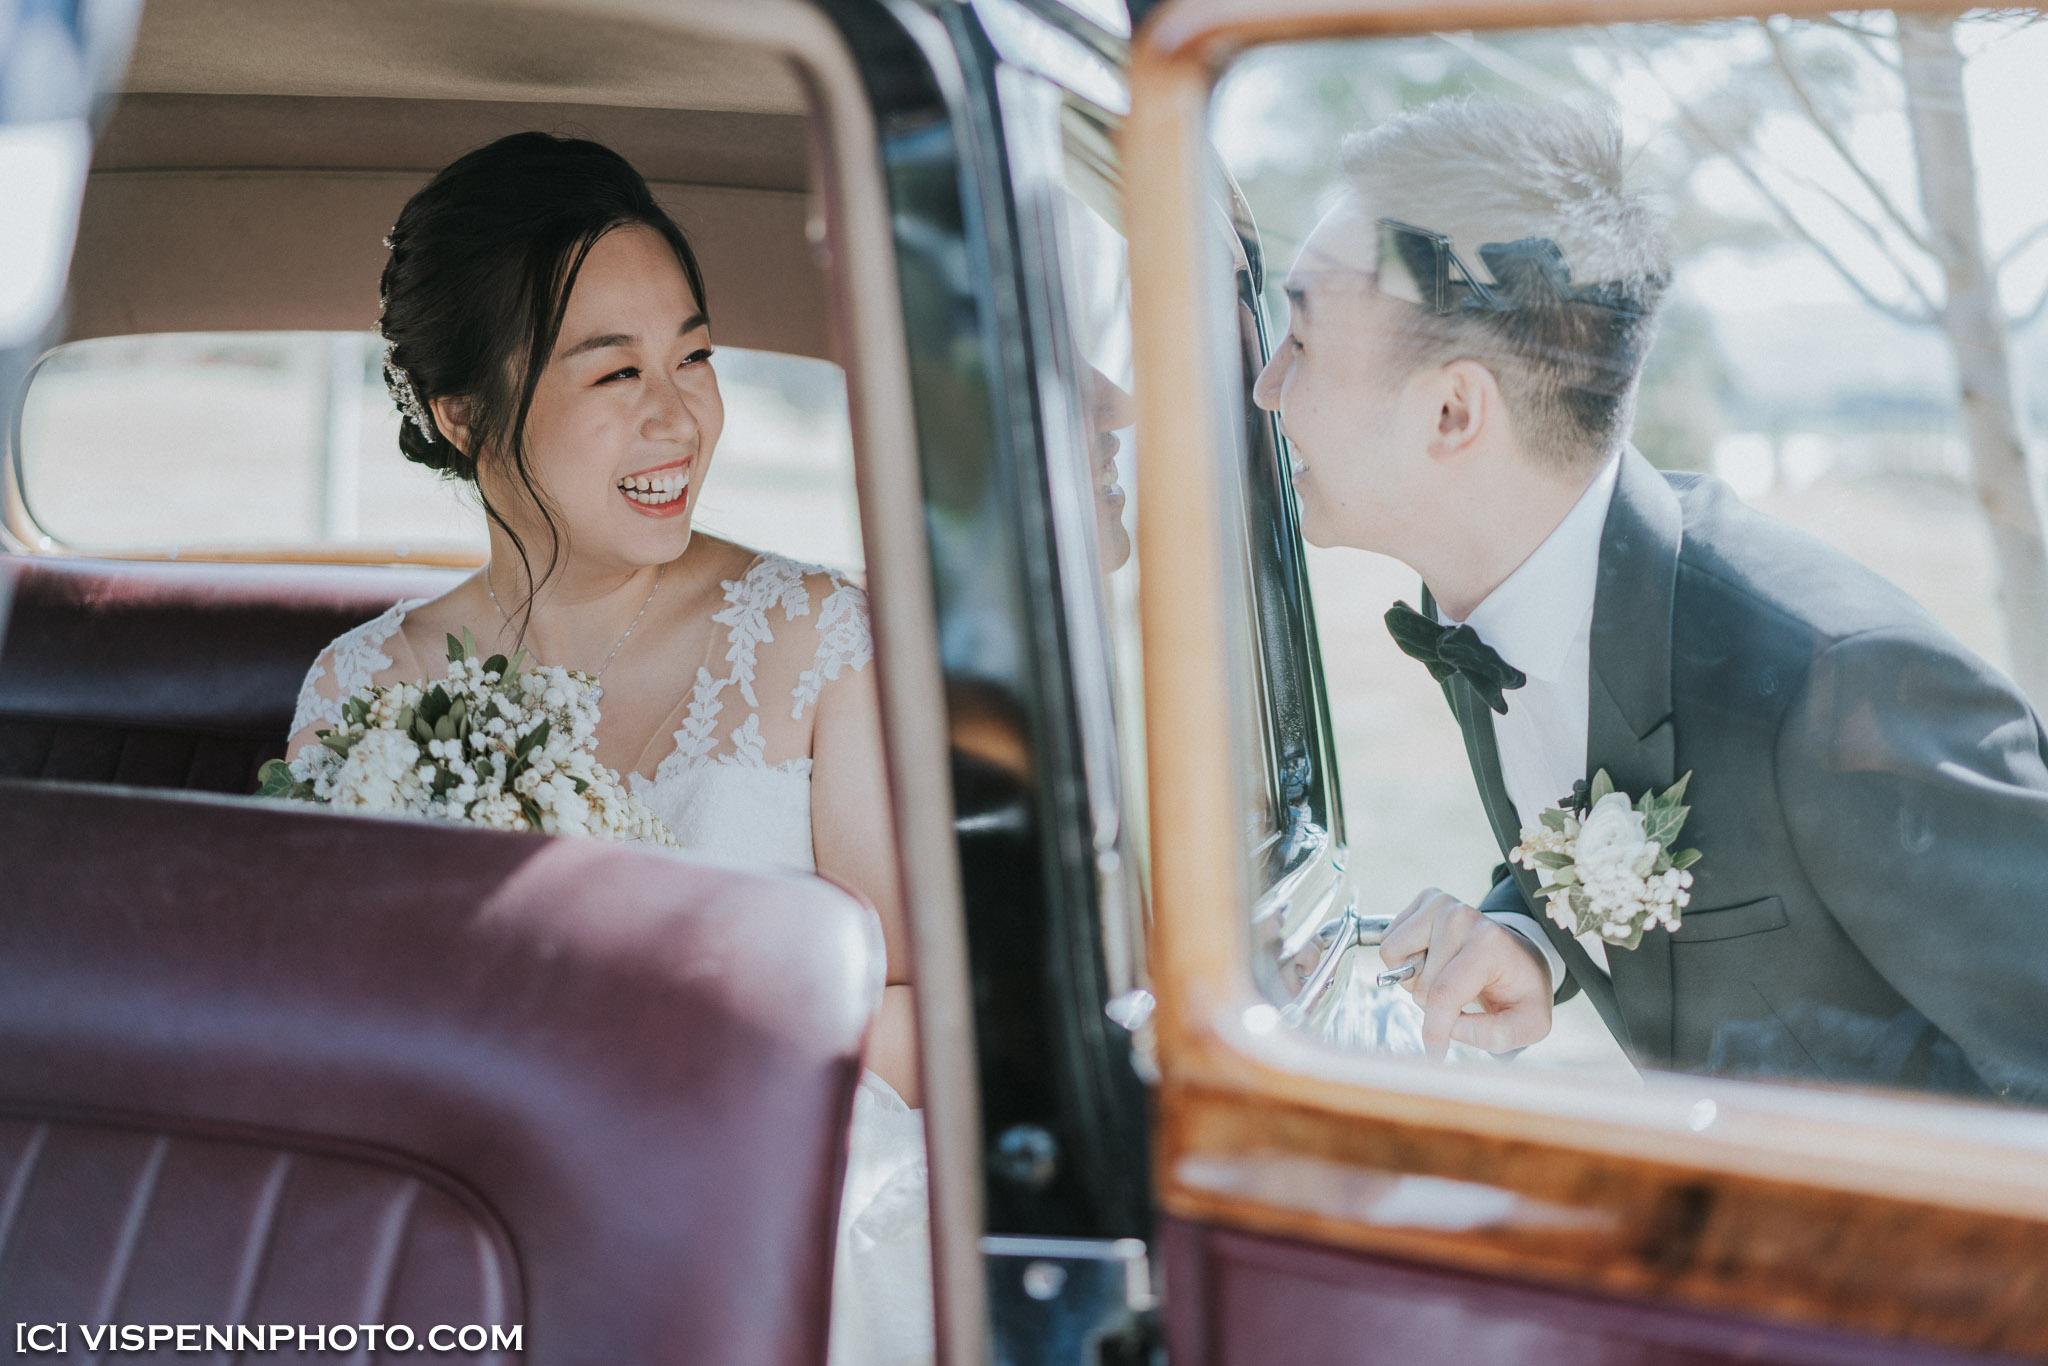 WEDDING DAY Photography Melbourne VISPENN 墨尔本 婚礼跟拍 婚礼摄像 婚礼摄影 结婚照 登记照 LeanneWesley 02699 4H A7R3 VISPENN